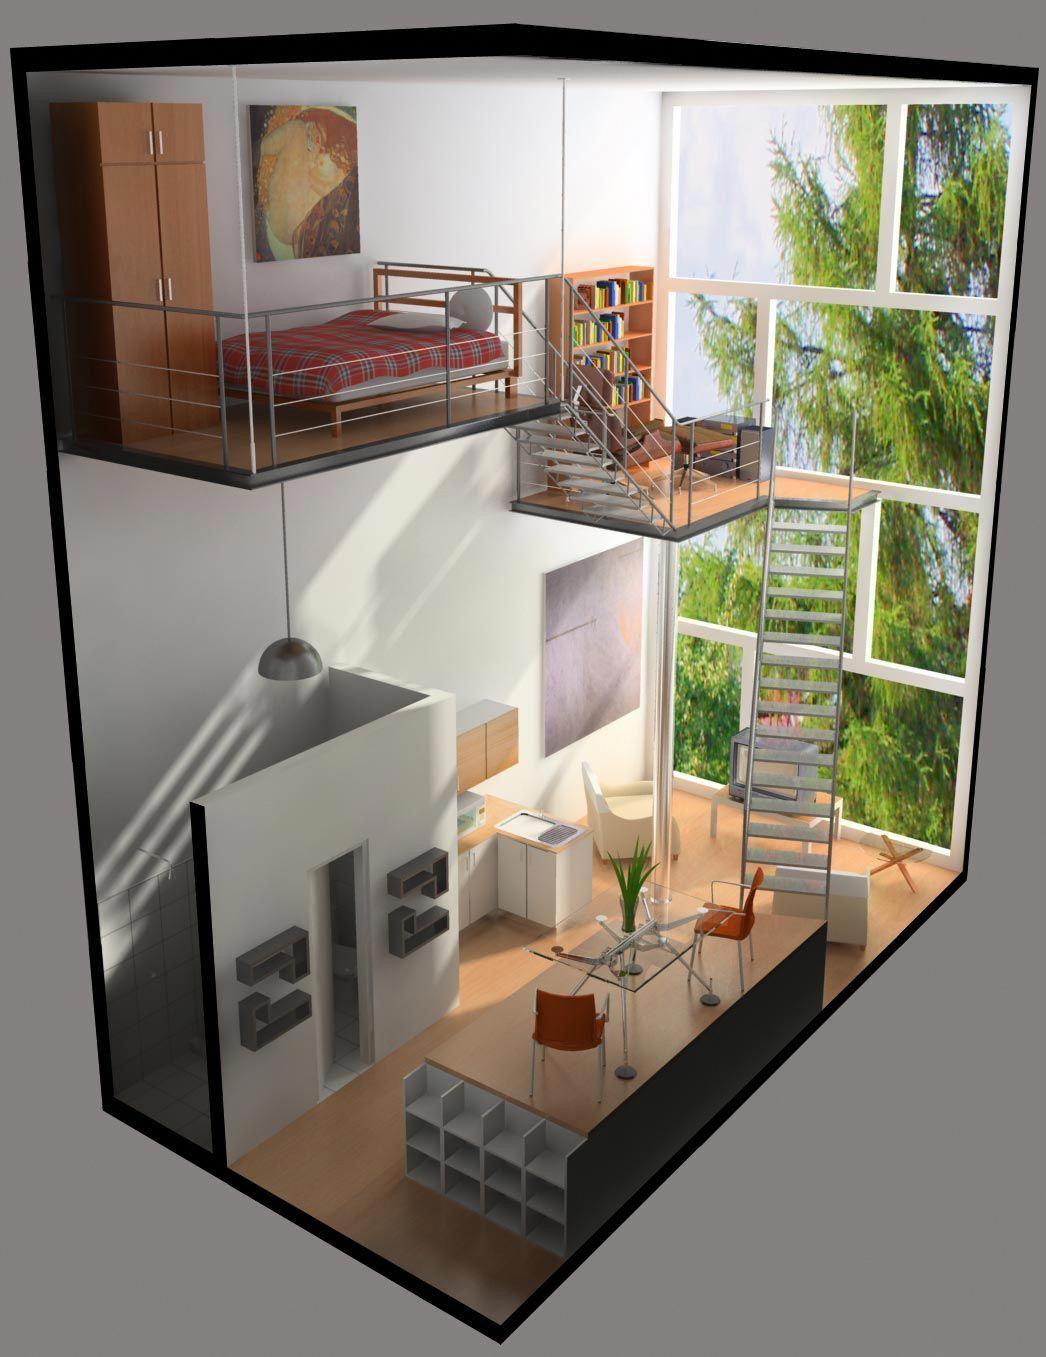 dinteriordesign small house plans casa ideal apartments loft design tiny also plantas  diy in rh pinterest